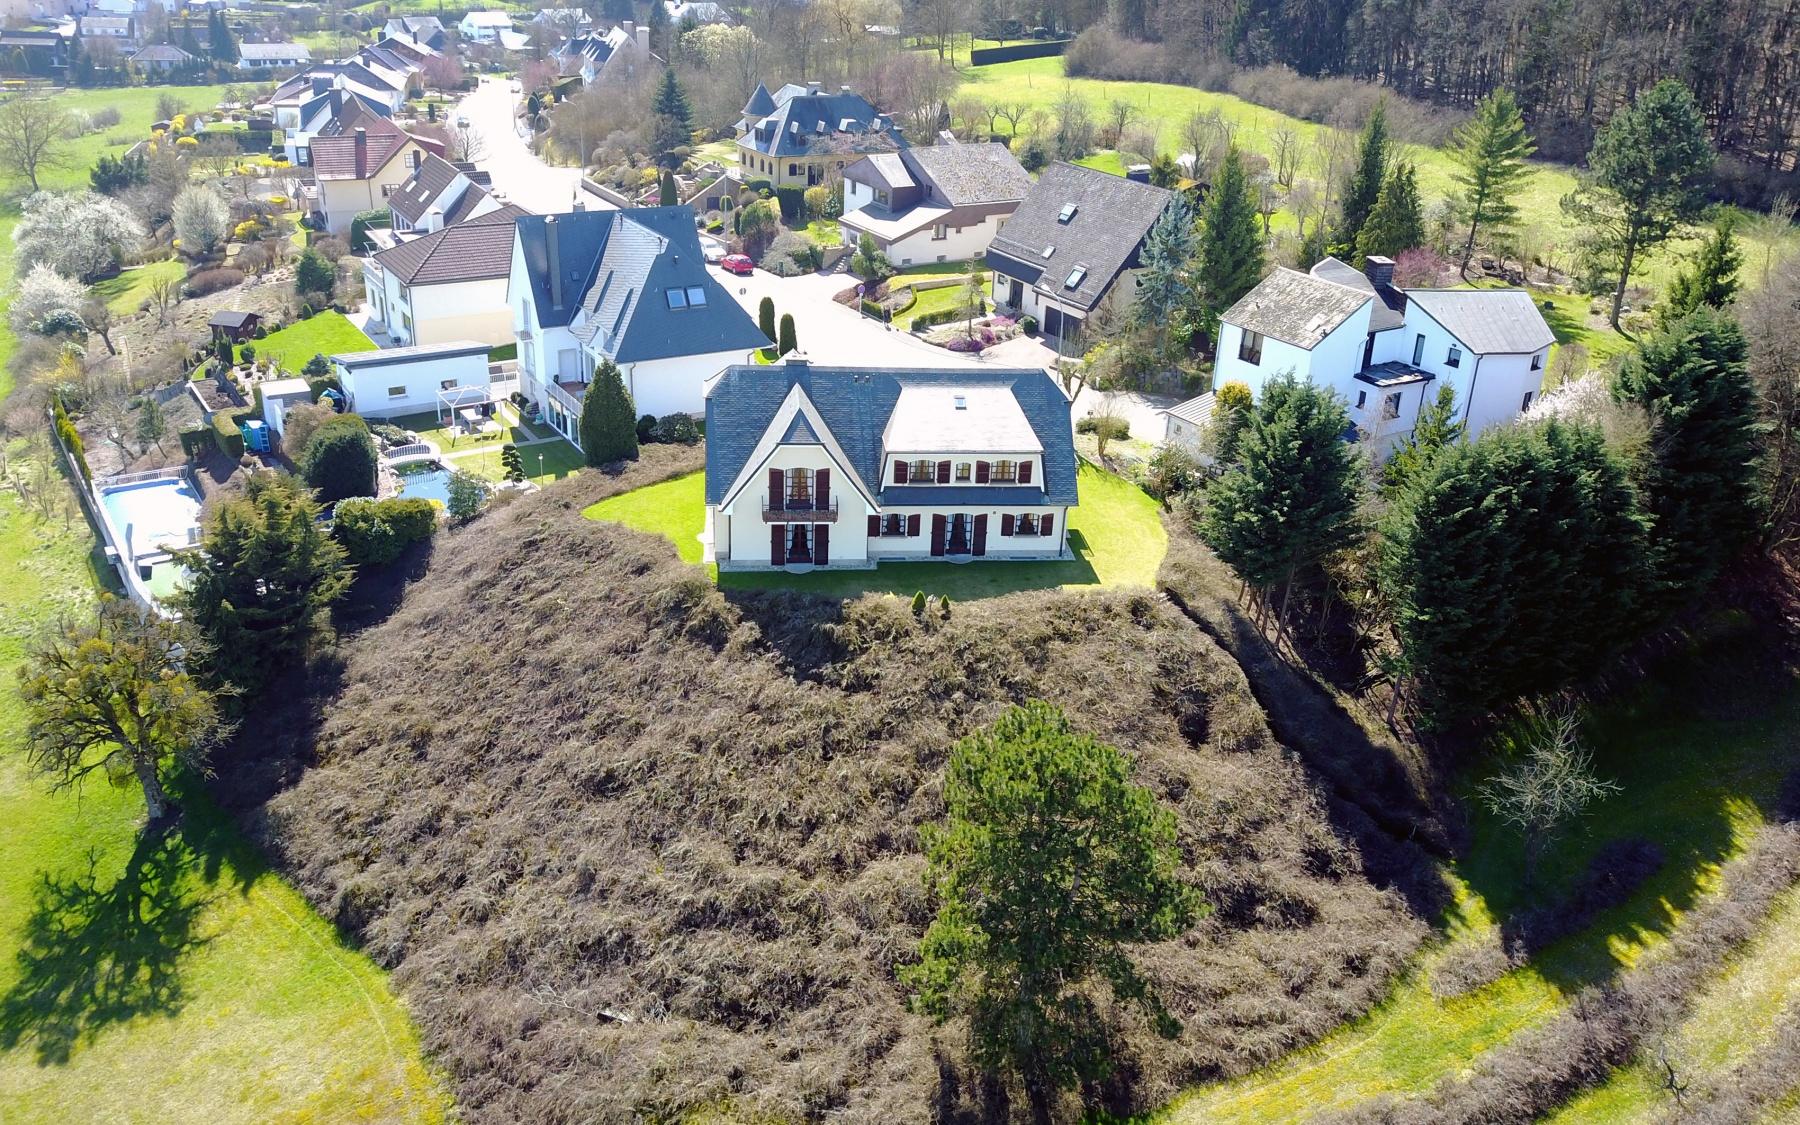 Maison à Munsbach